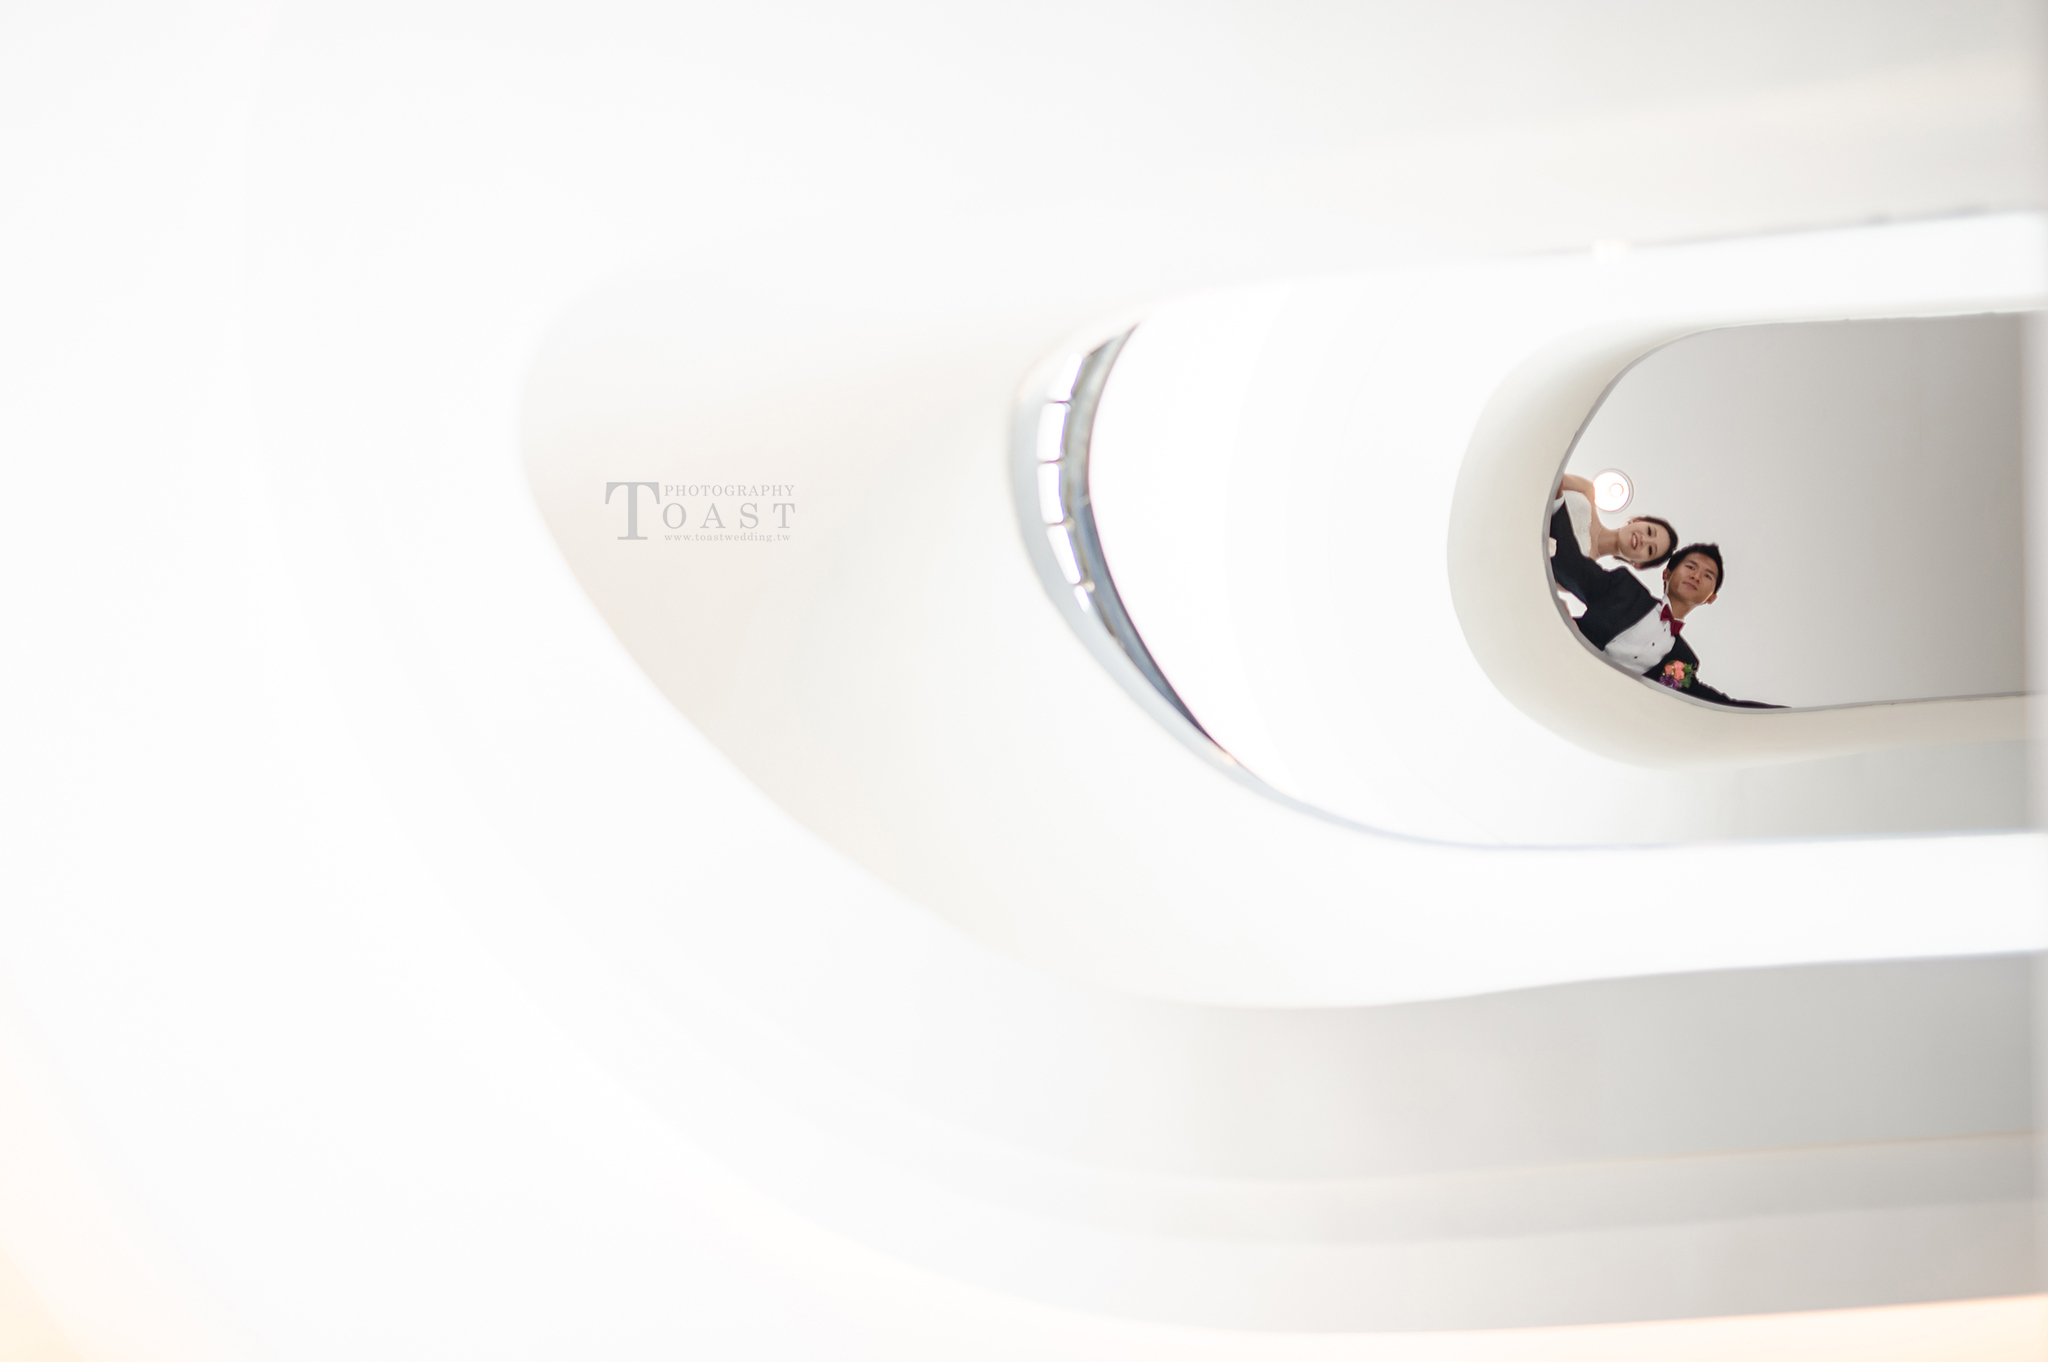 15380864464_86c899570a_o-法豆影像工作室_婚攝, 婚禮攝影, 婚禮紀錄, 婚紗攝影, 自助婚紗, 婚攝推薦, 攝影棚出租, 攝影棚租借, 孕婦禮服出租, 孕婦禮服租借, CEO專業形象照, 形像照, 型像照, 型象照. 形象照團拍, 全家福, 全家福團拍, 招團, 揪團拍, 親子寫真, 家庭寫真, 抓周, 抓周團拍